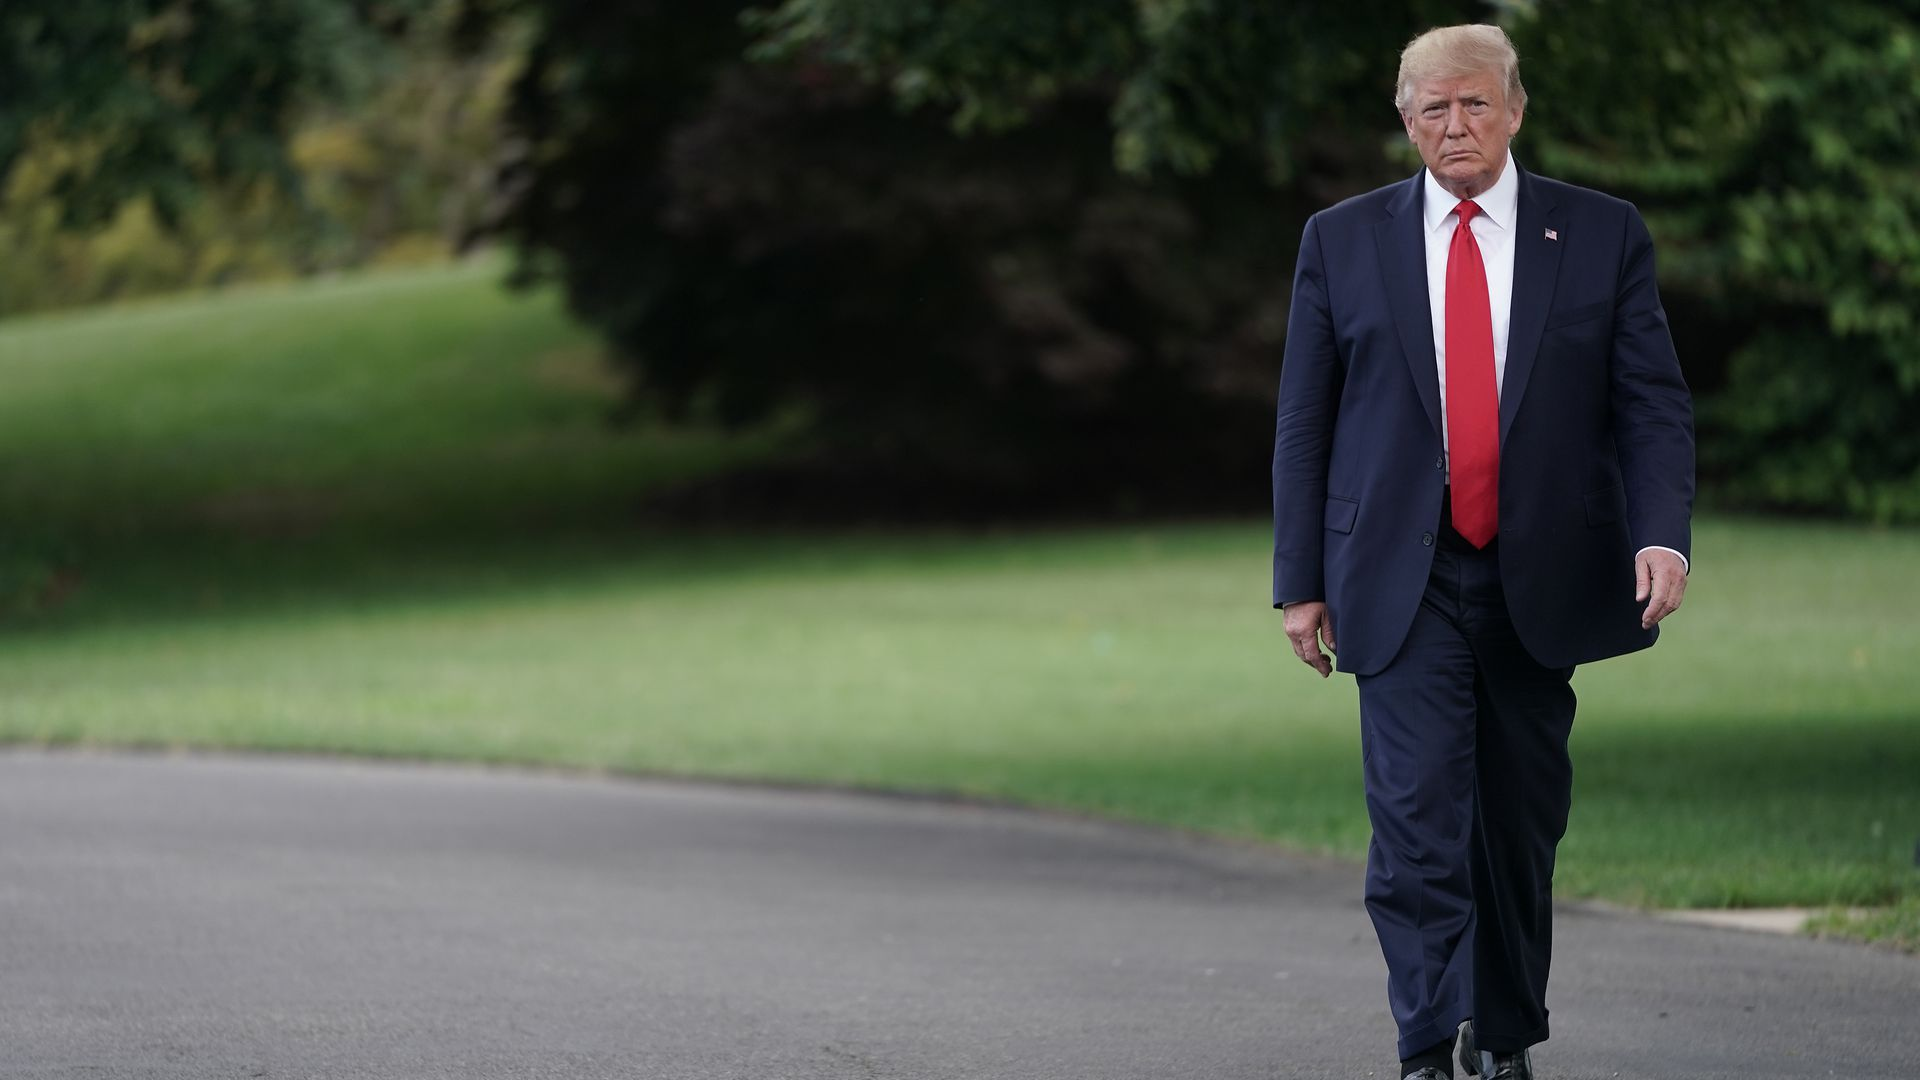 DHS reforming investor visa, despite last-minute Trump doubts